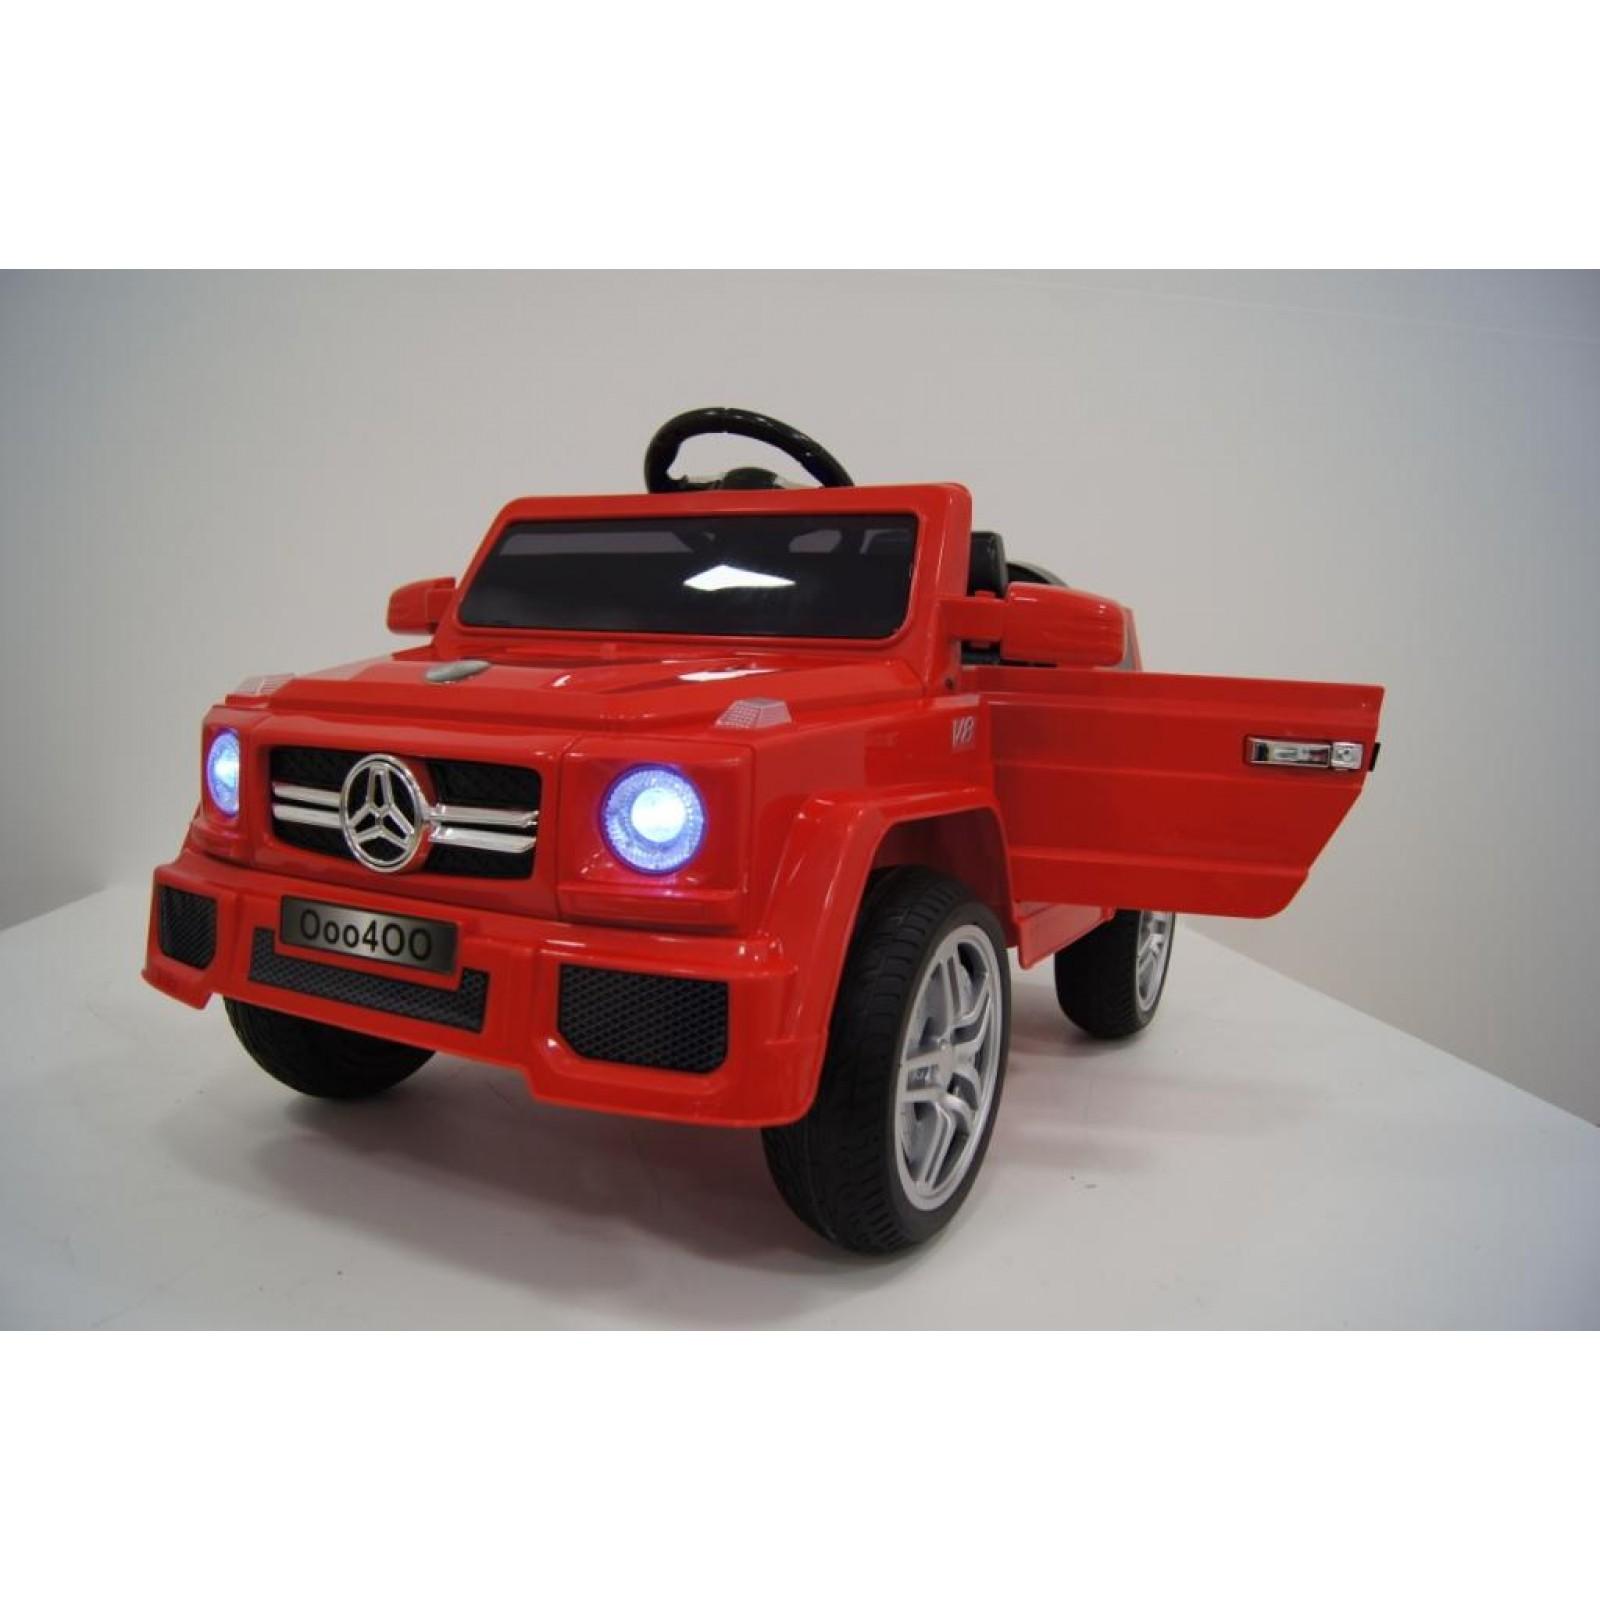 Детский электромобиль Merc O004OO VIP